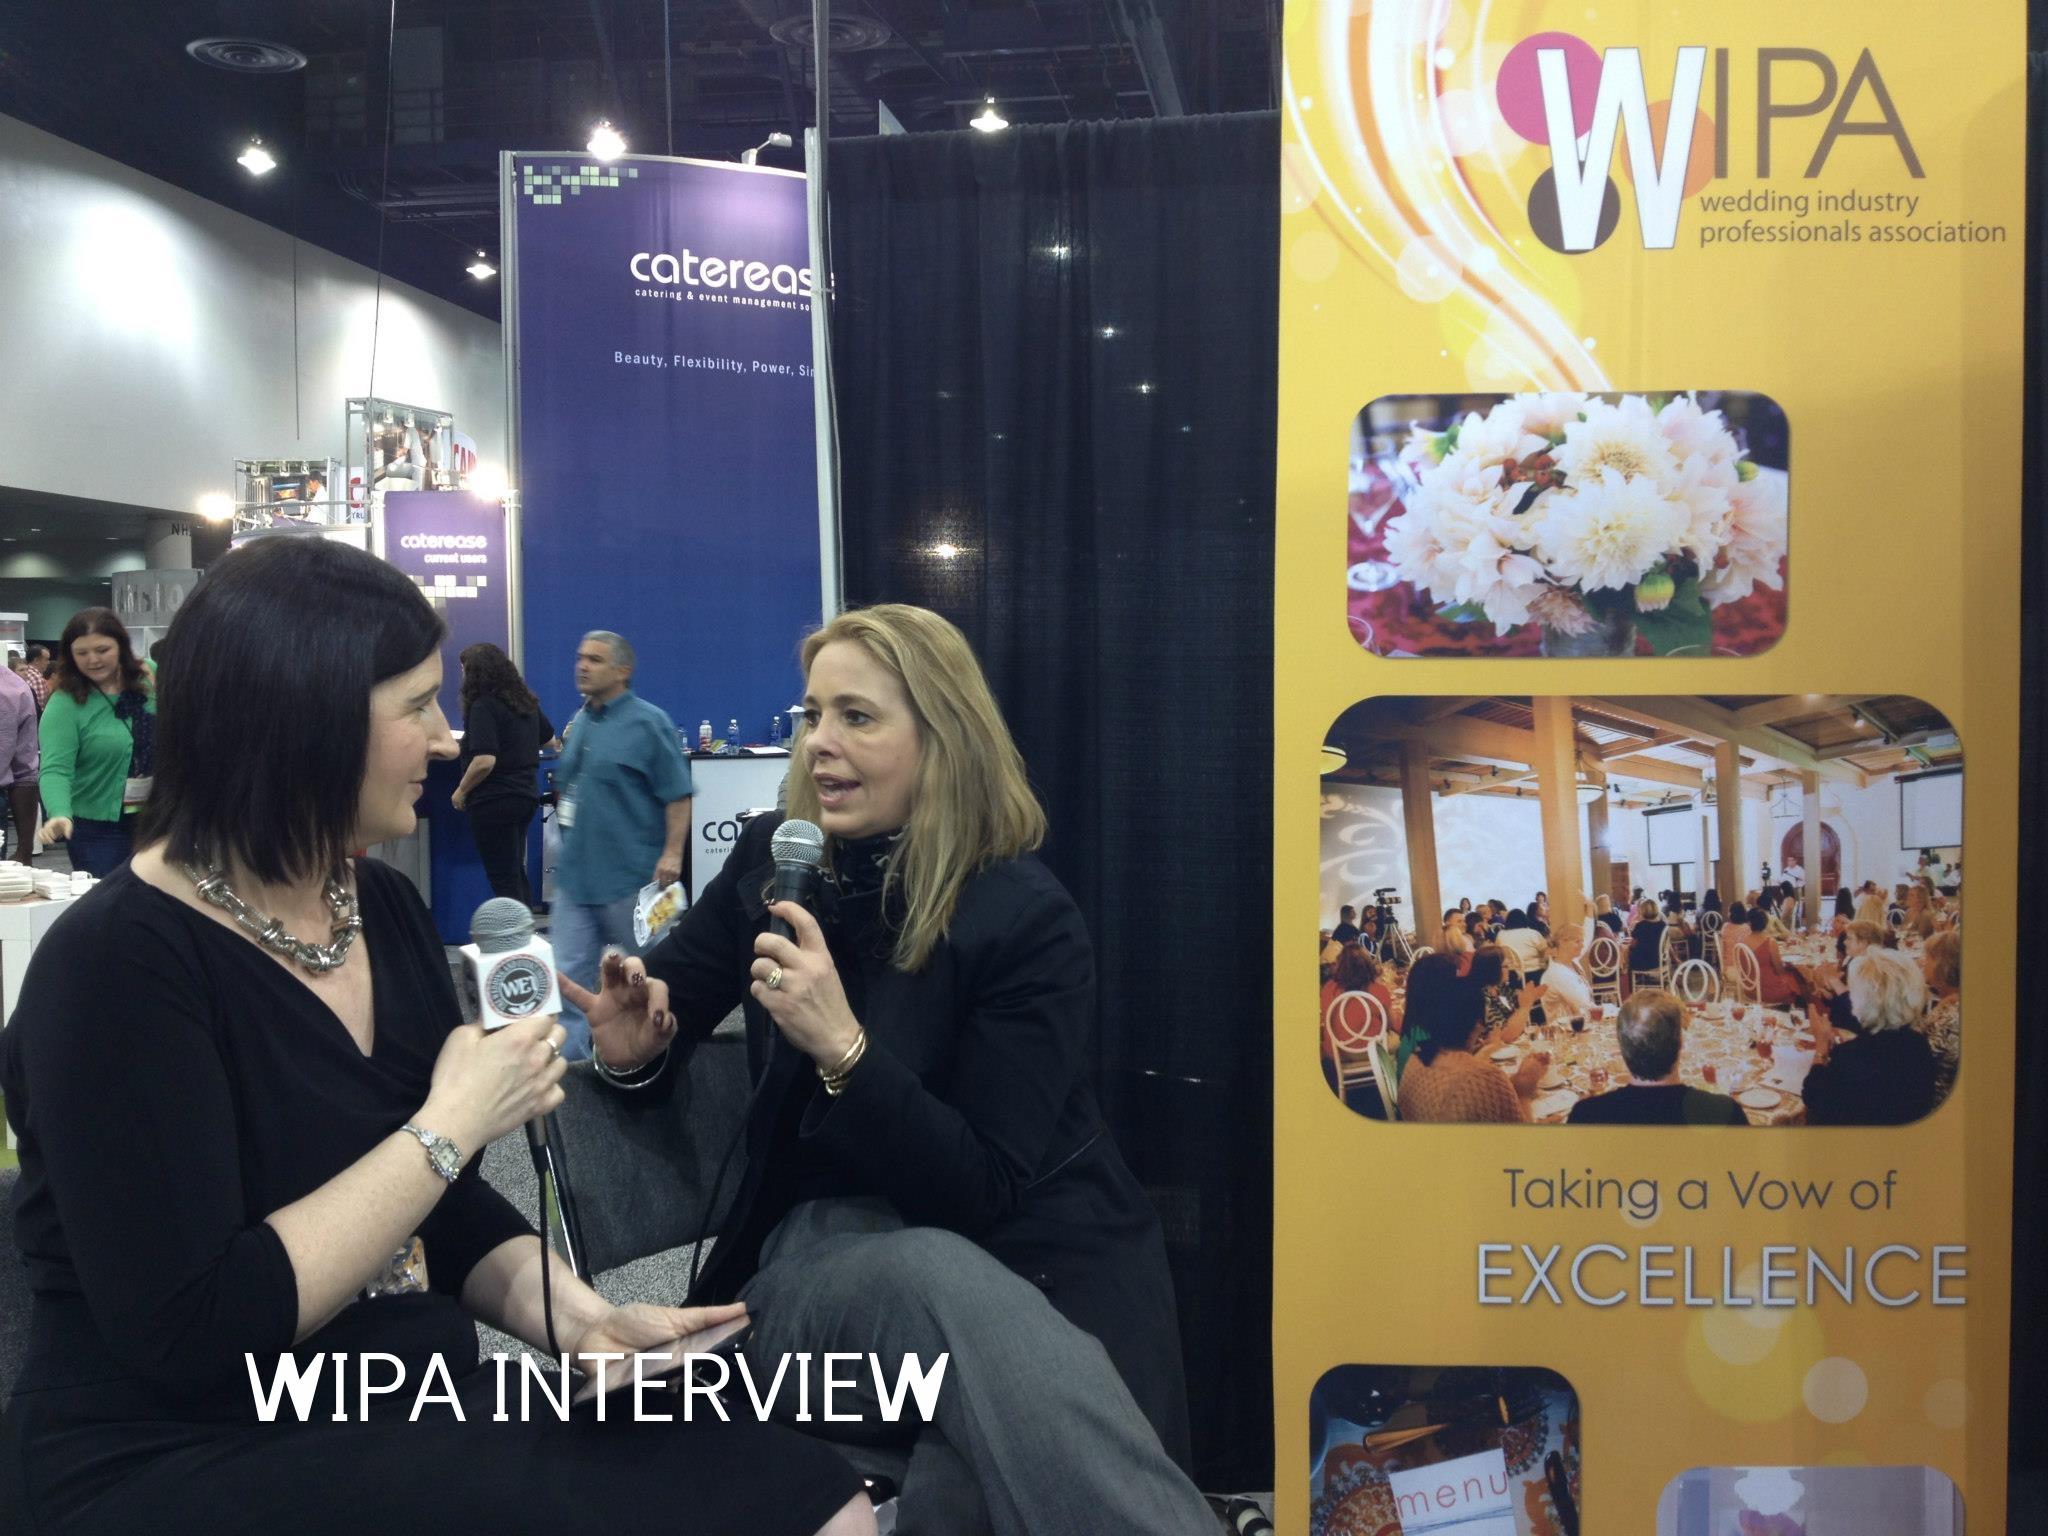 WIPA INTERVIEW